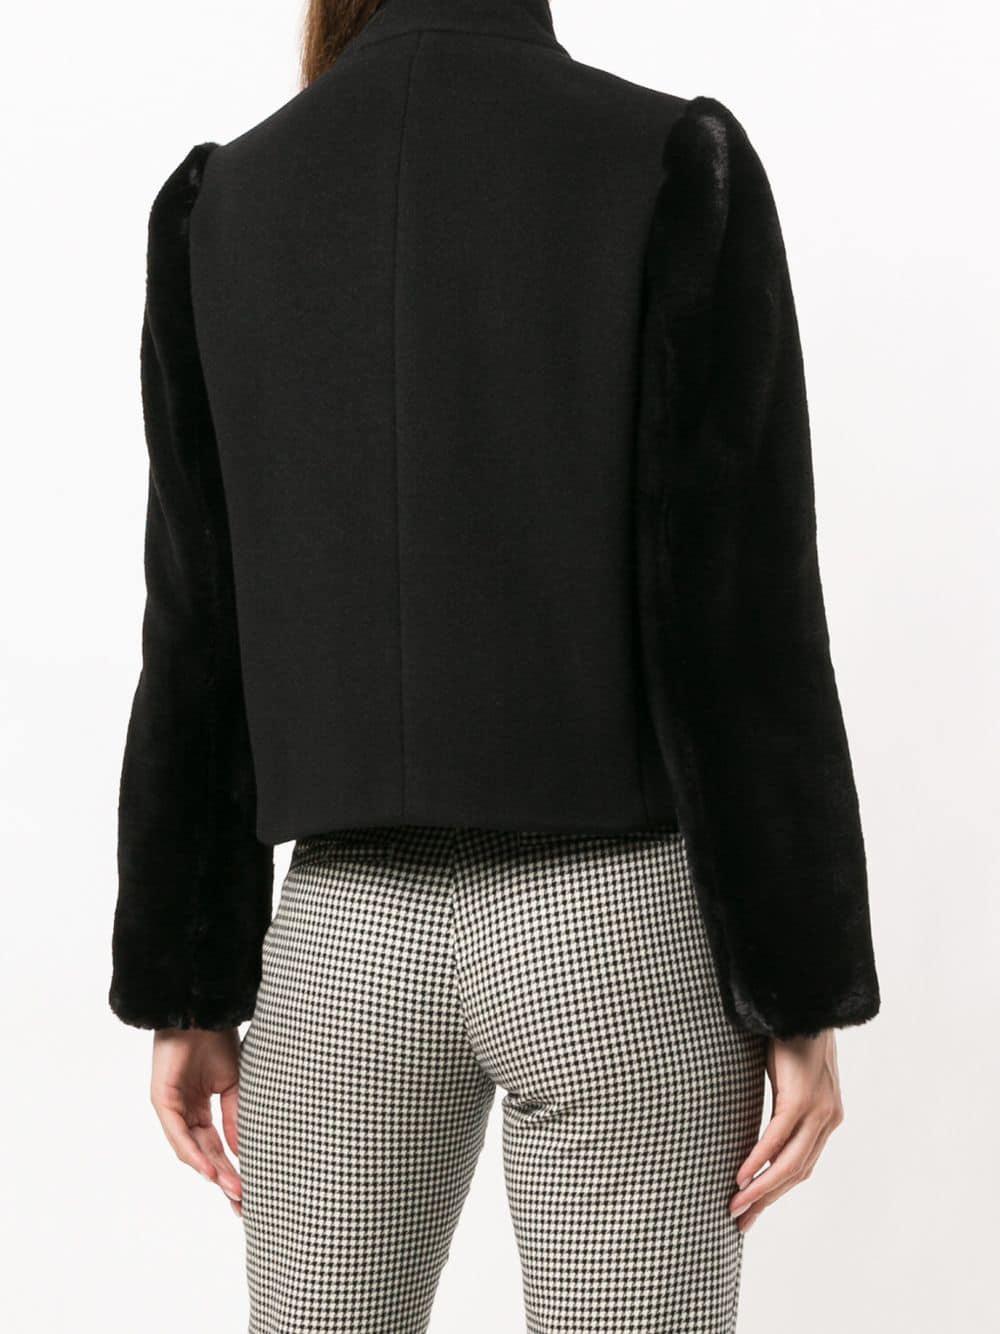 478d2a2cbdda Emporio Armani - Black Double Breasted Jacket - Lyst. View fullscreen